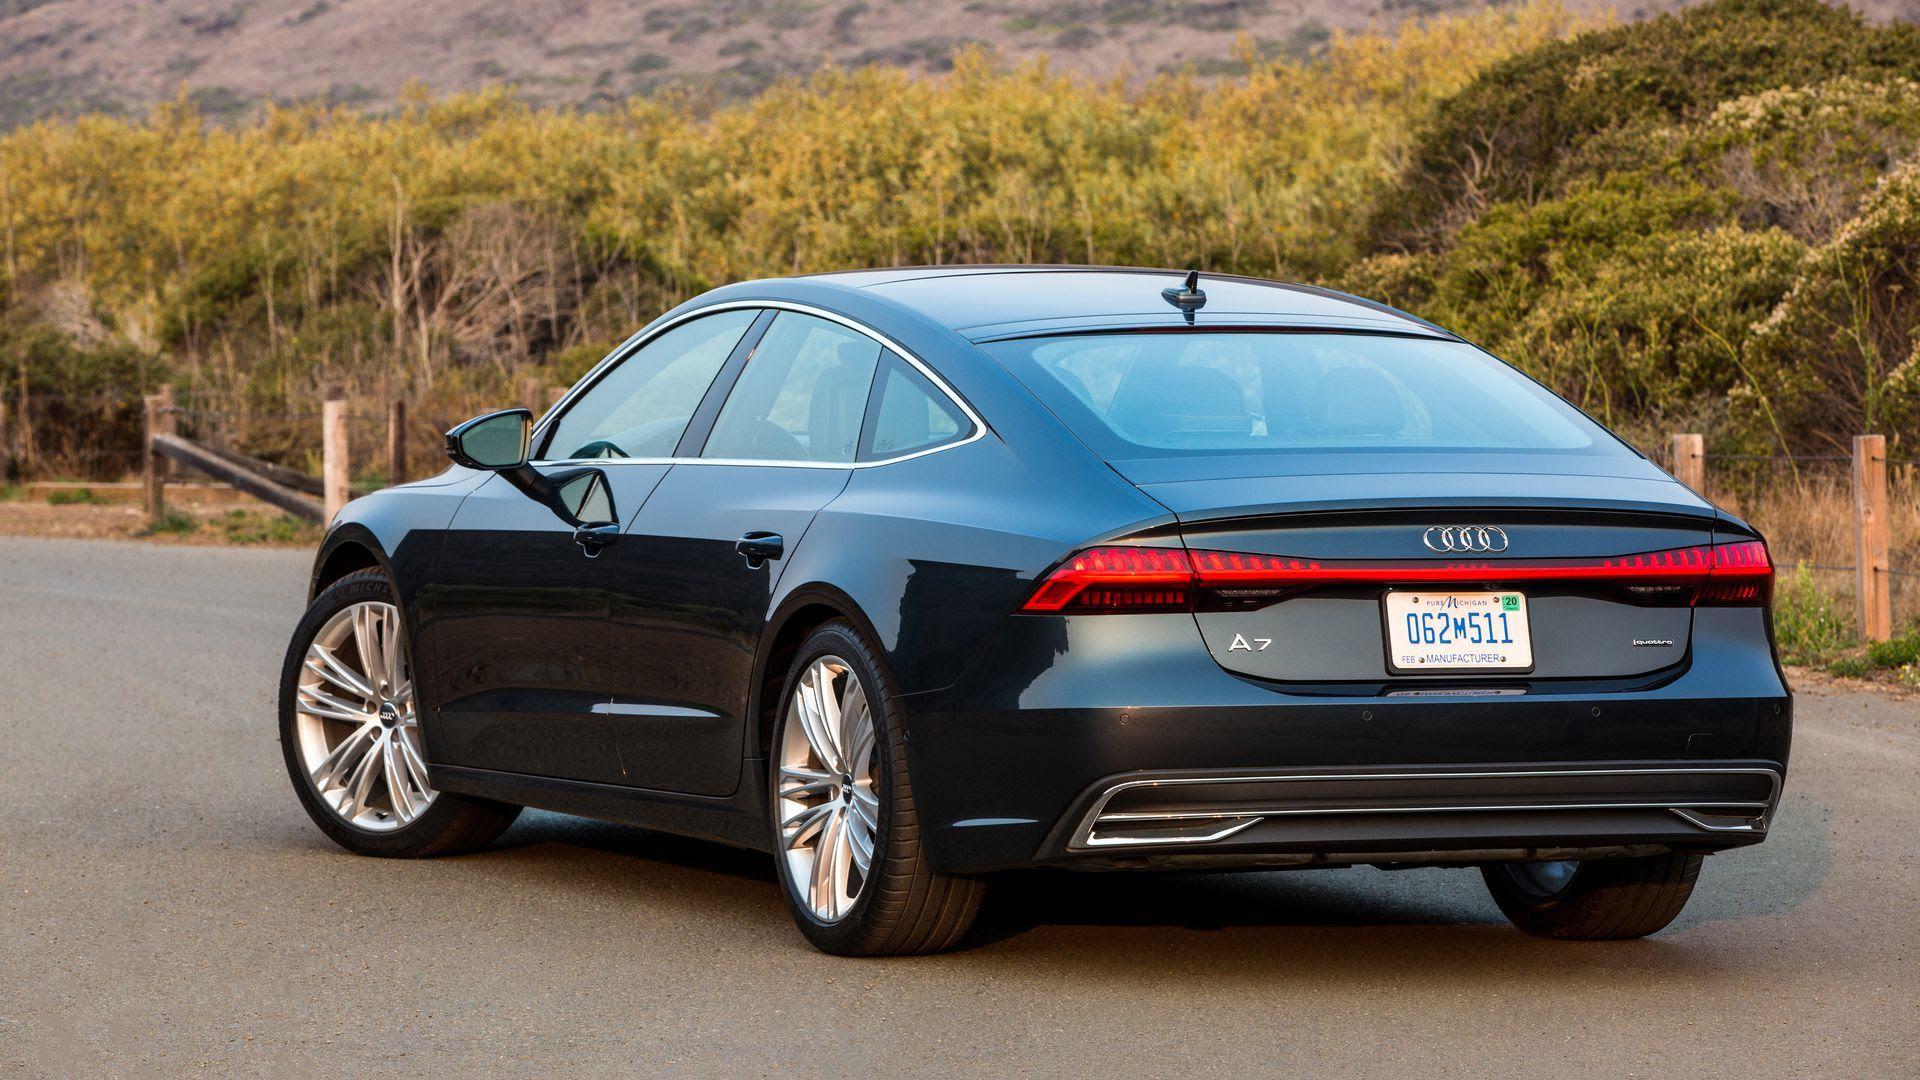 Kekurangan A7 Audi 2019 Tangguh